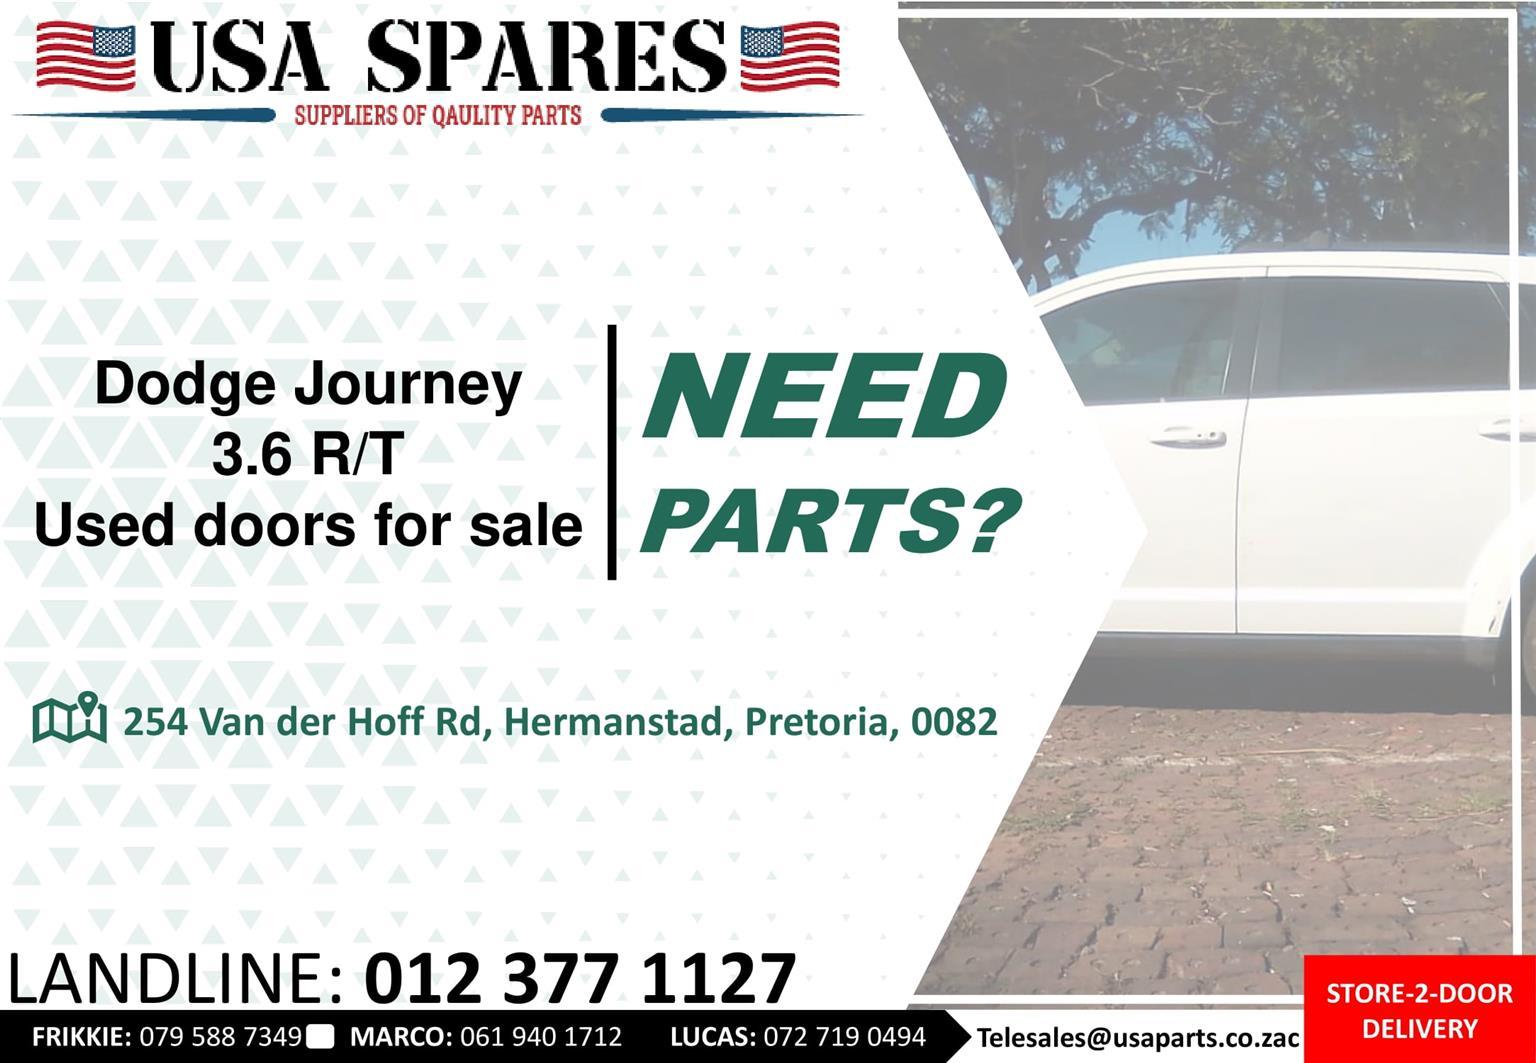 Dodge Journey 3.6 RT used doors for sale